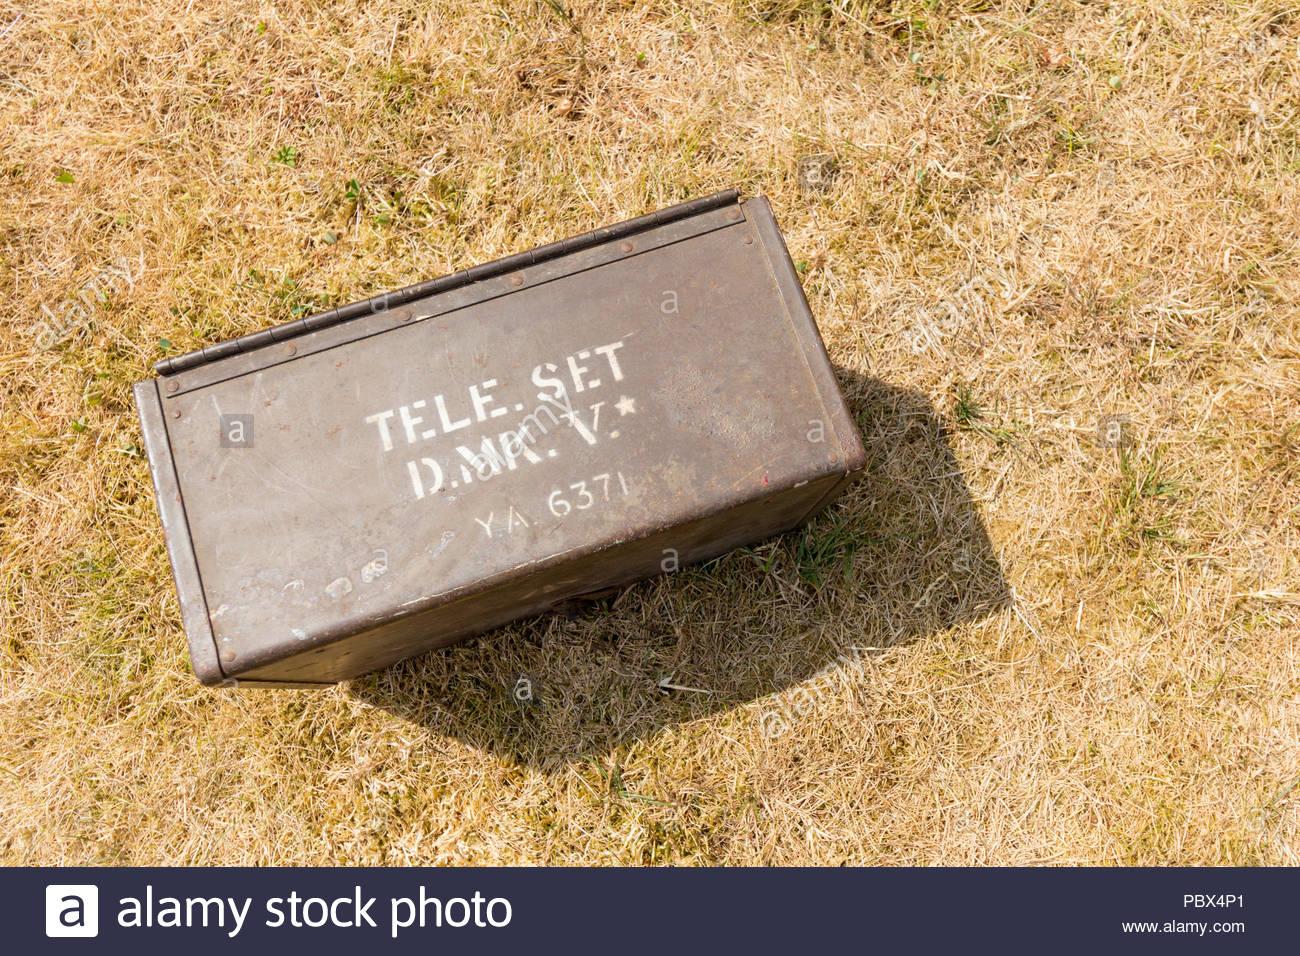 Military Field Telephone - Tele Set D. Mk. V - Stock Image